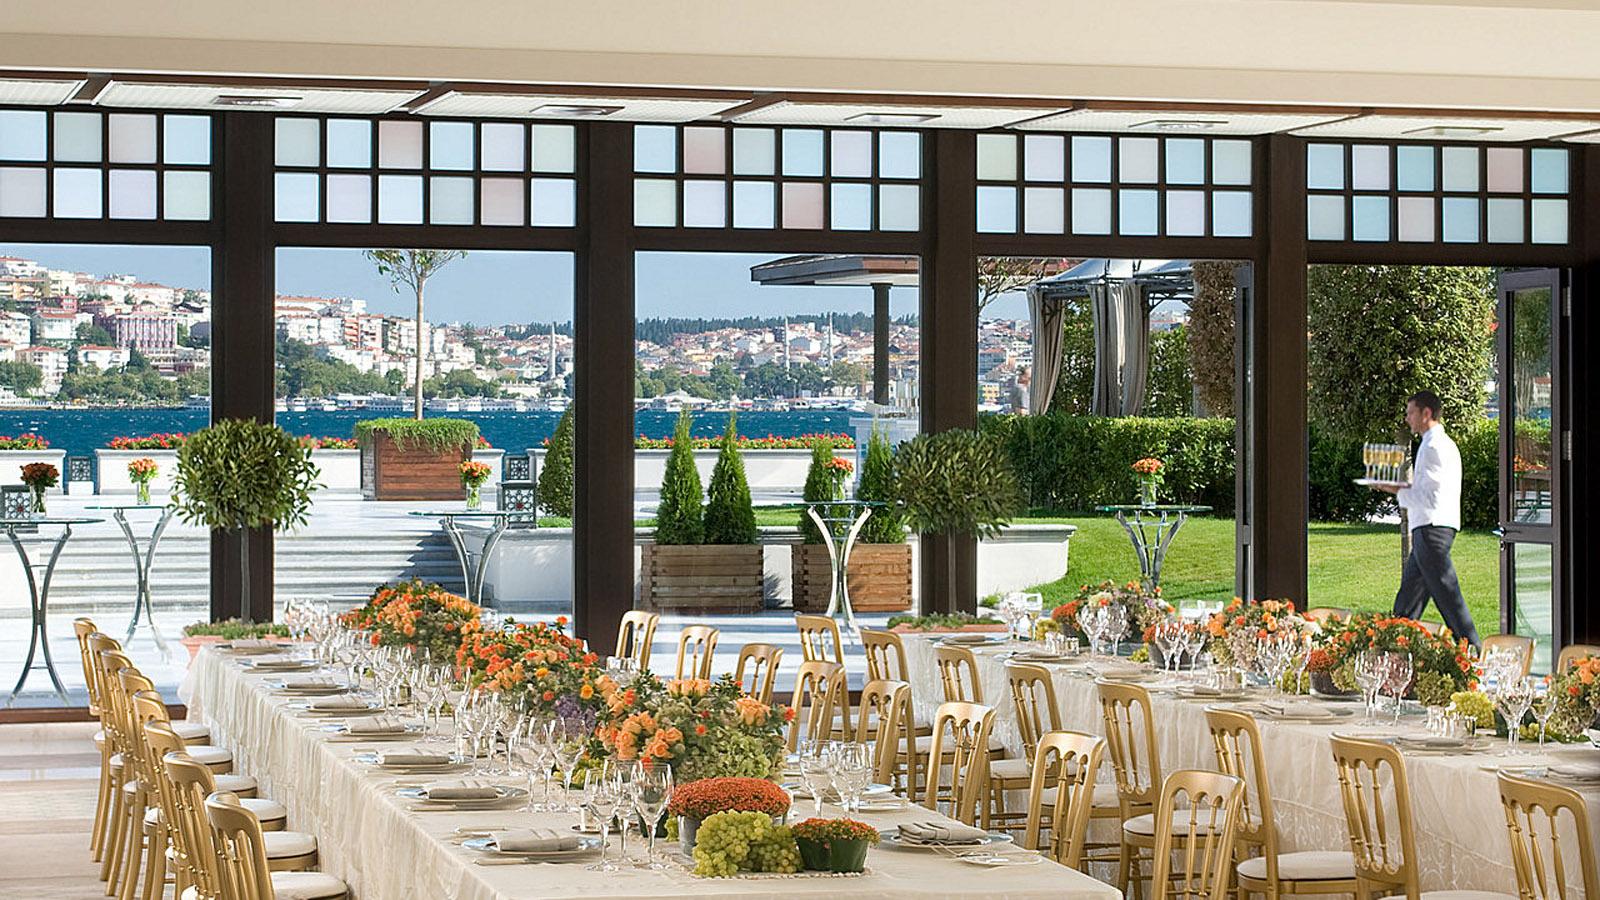 Ballroom Outdoor Wedding Venue Jogja: Wedding Venues In Istanbul